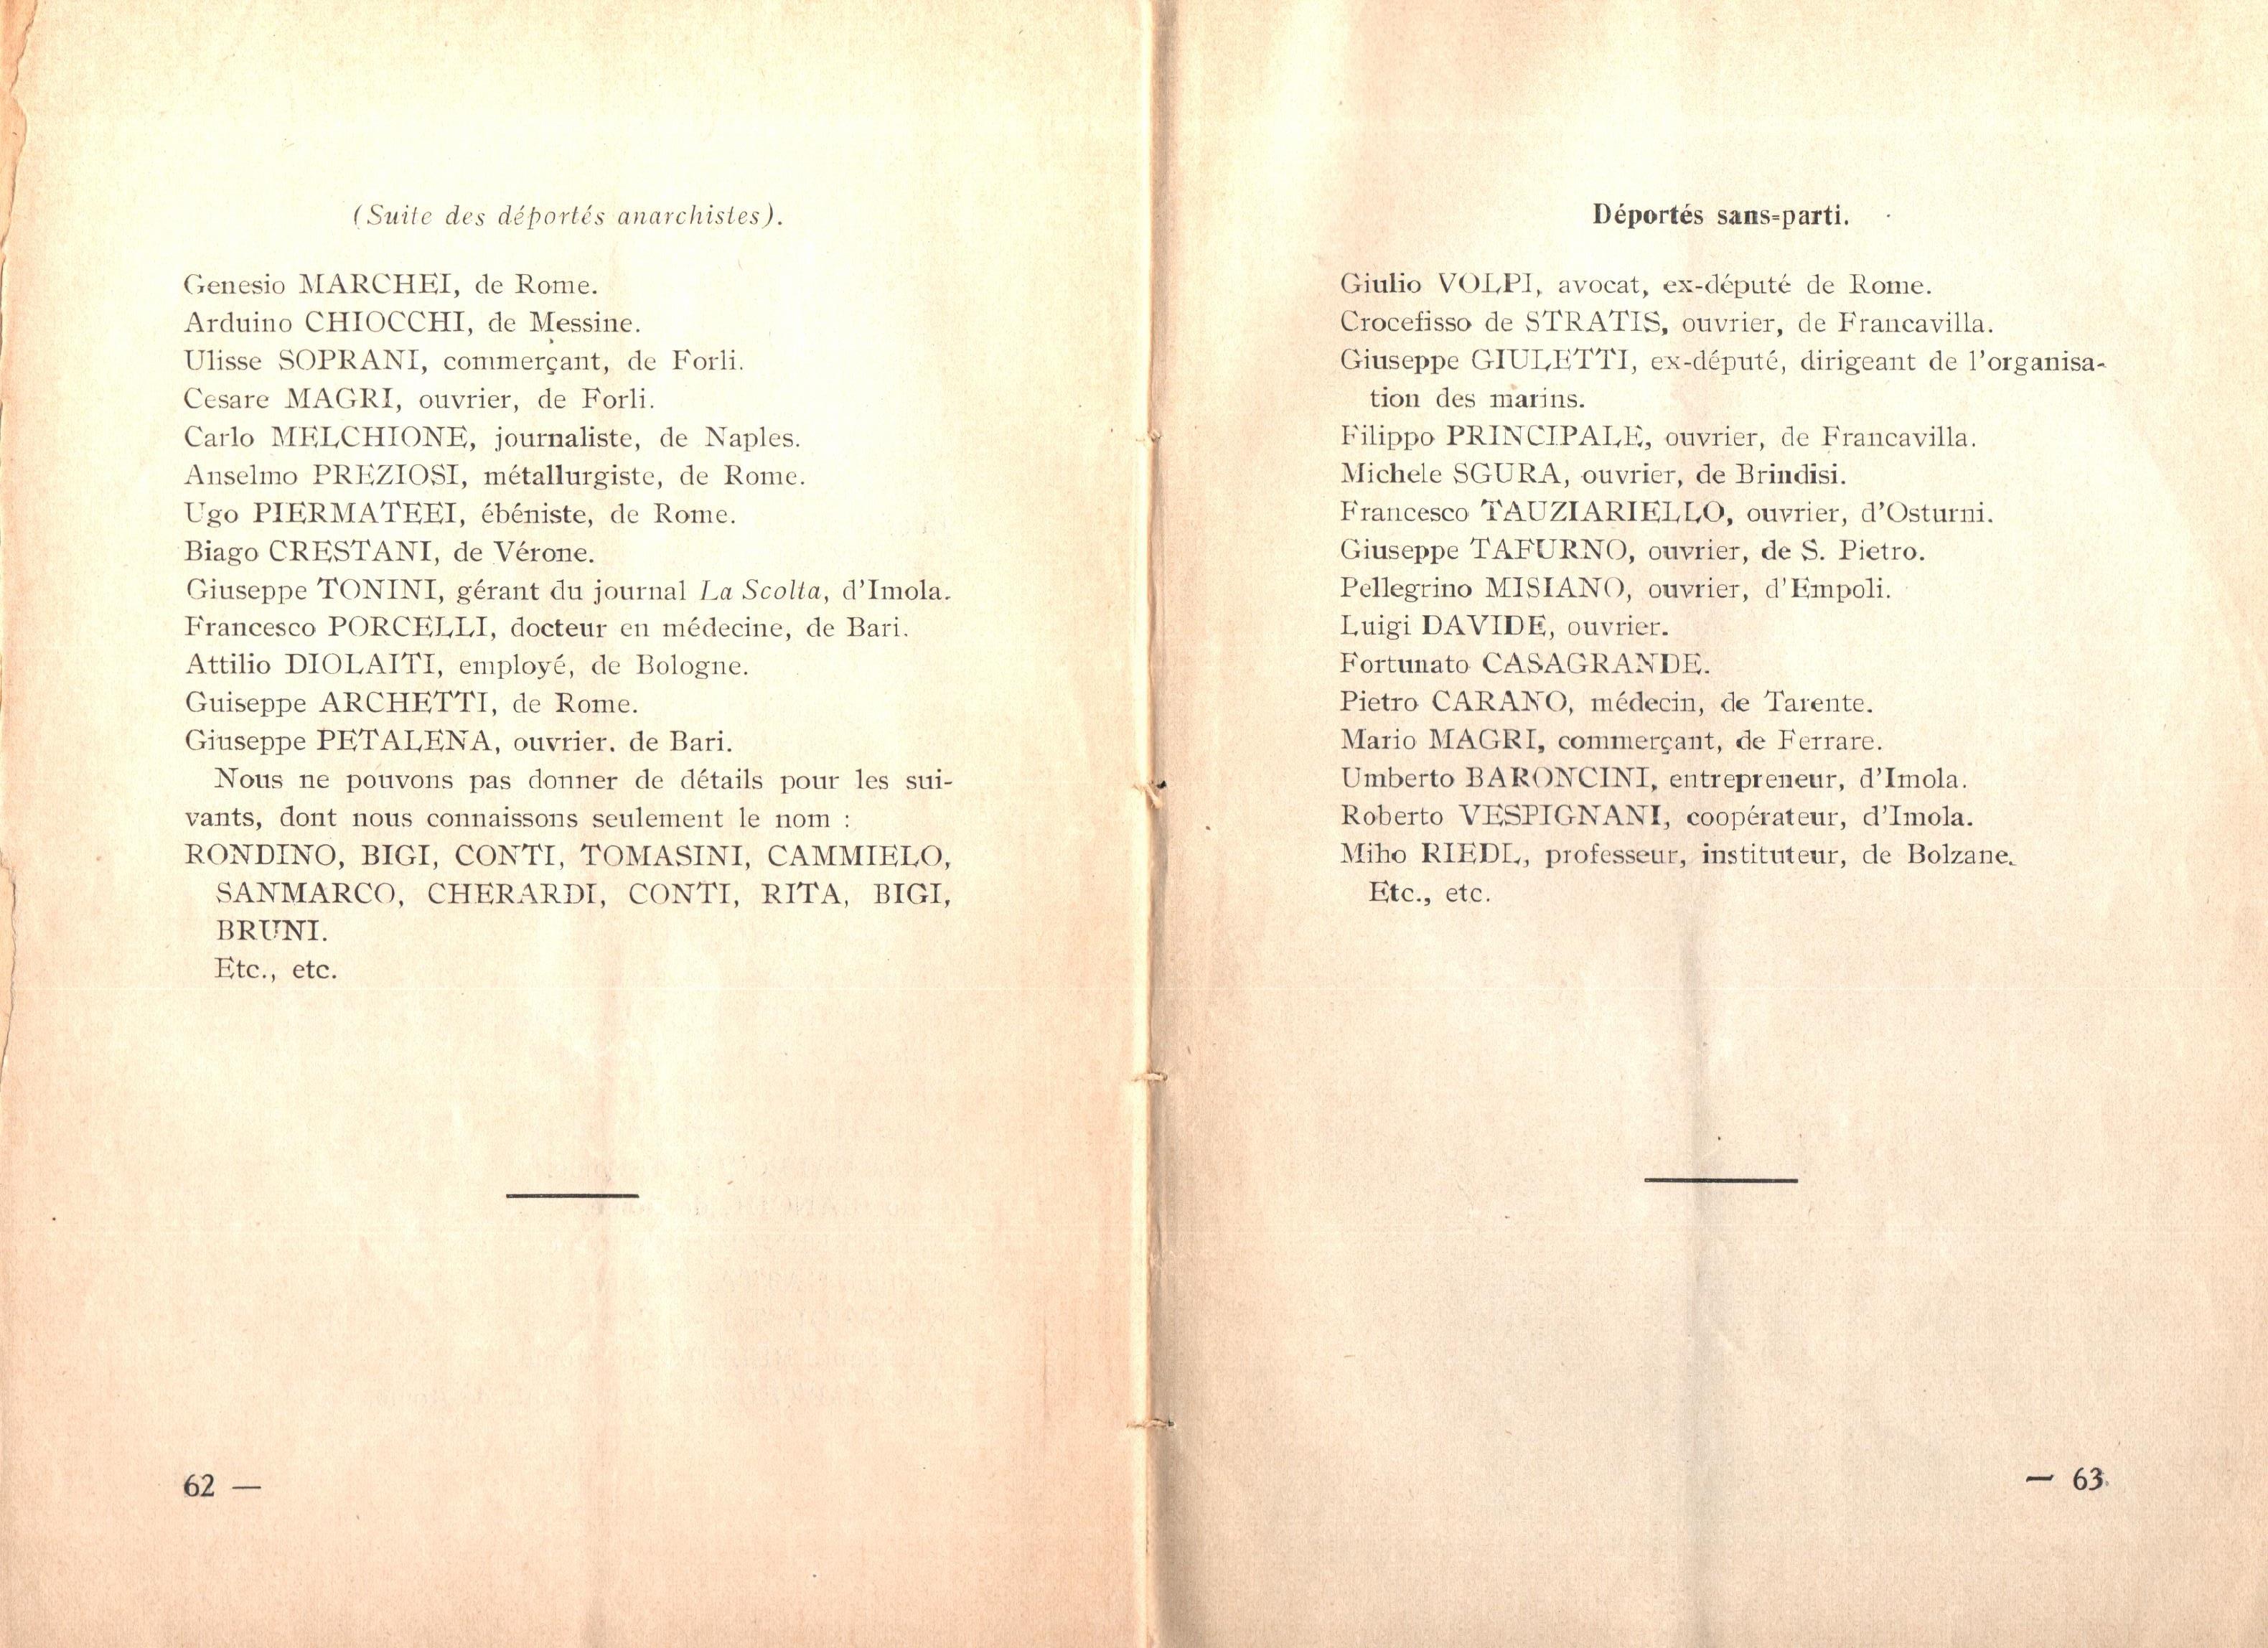 Nicola Cilla, Les «Cayennes» d'Italie - pag. 33